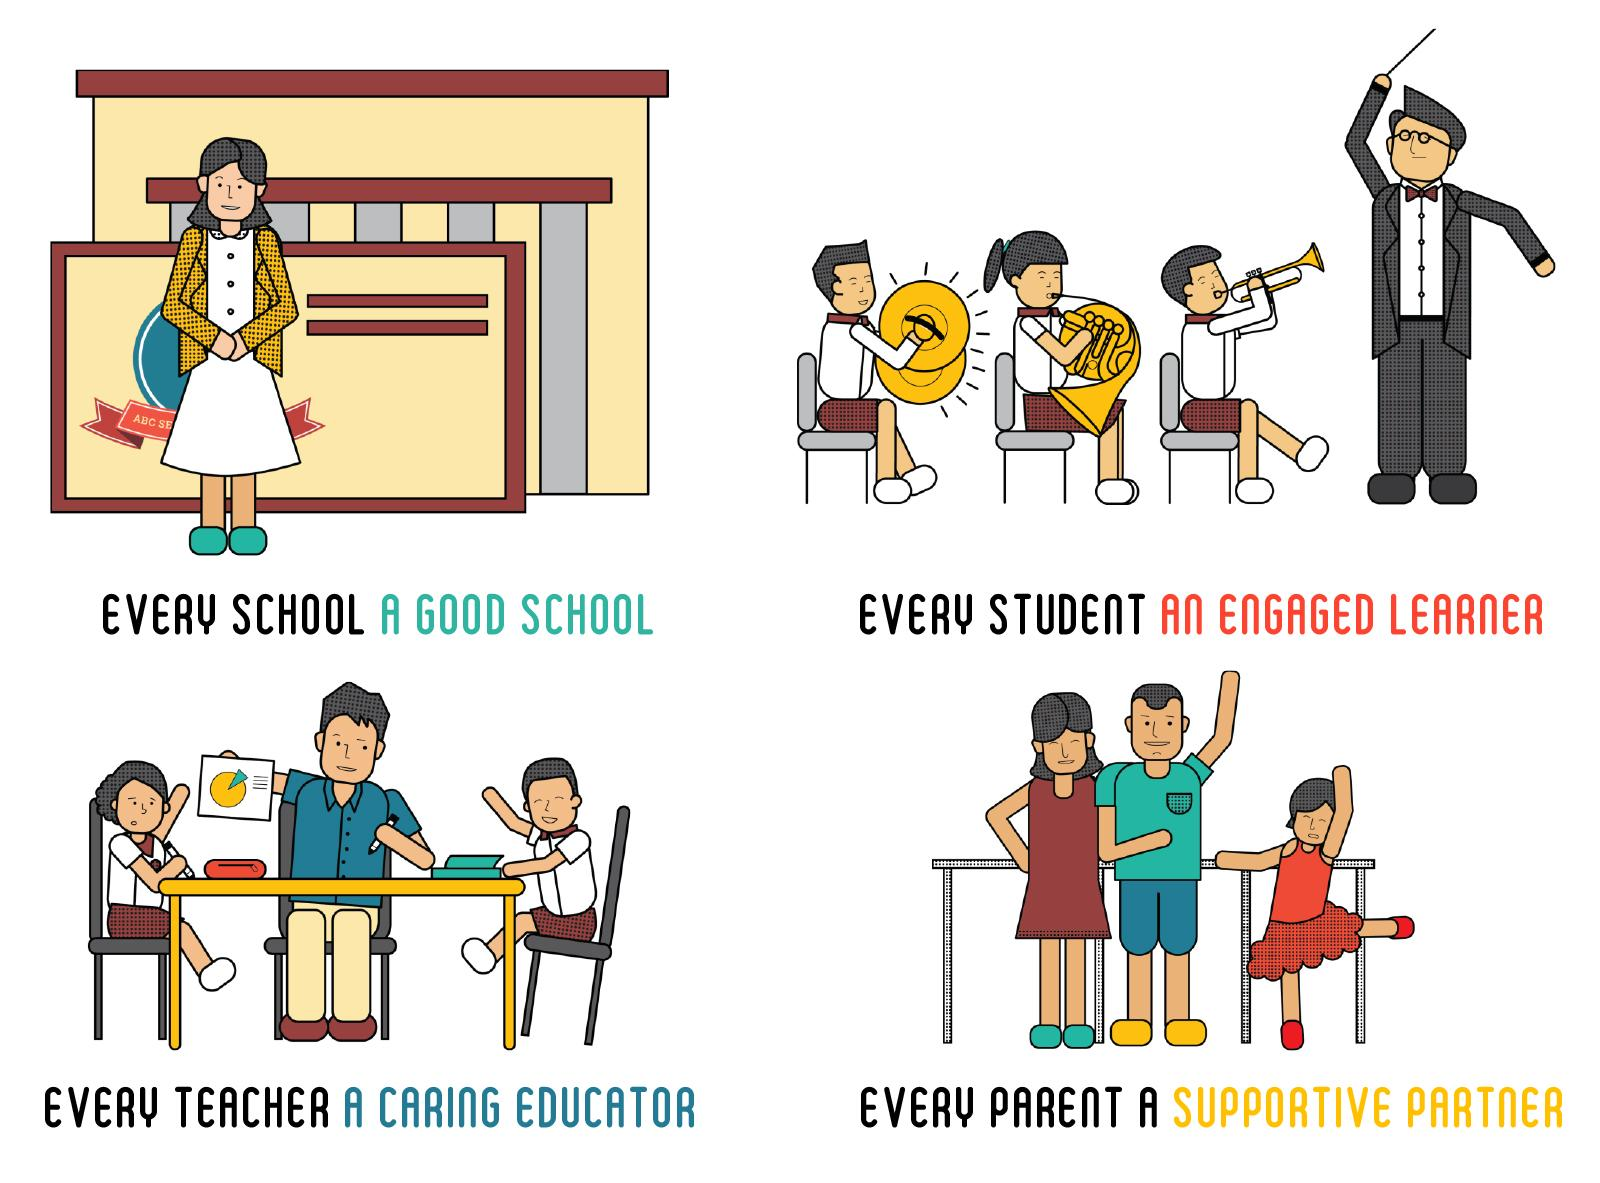 Every school a good school MOE